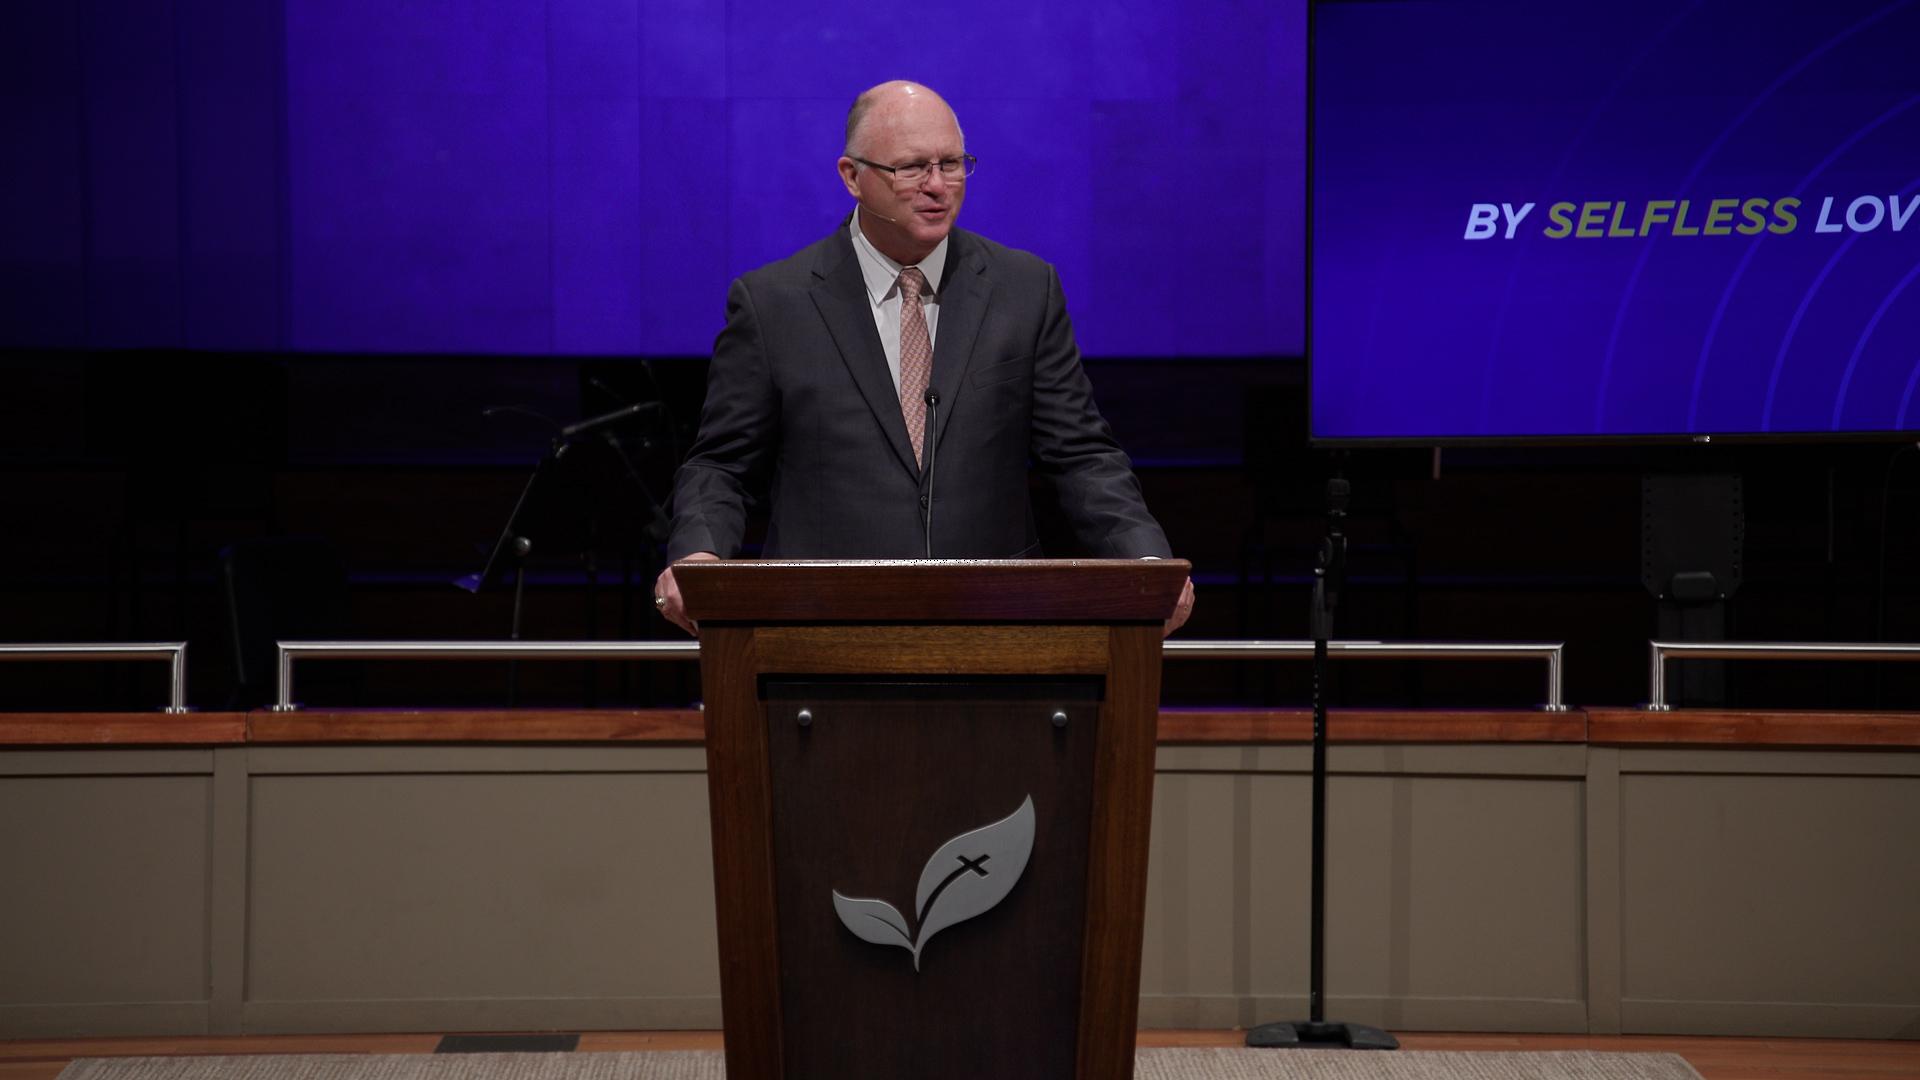 Pastor Paul Chappell: The Gospel in Marriage